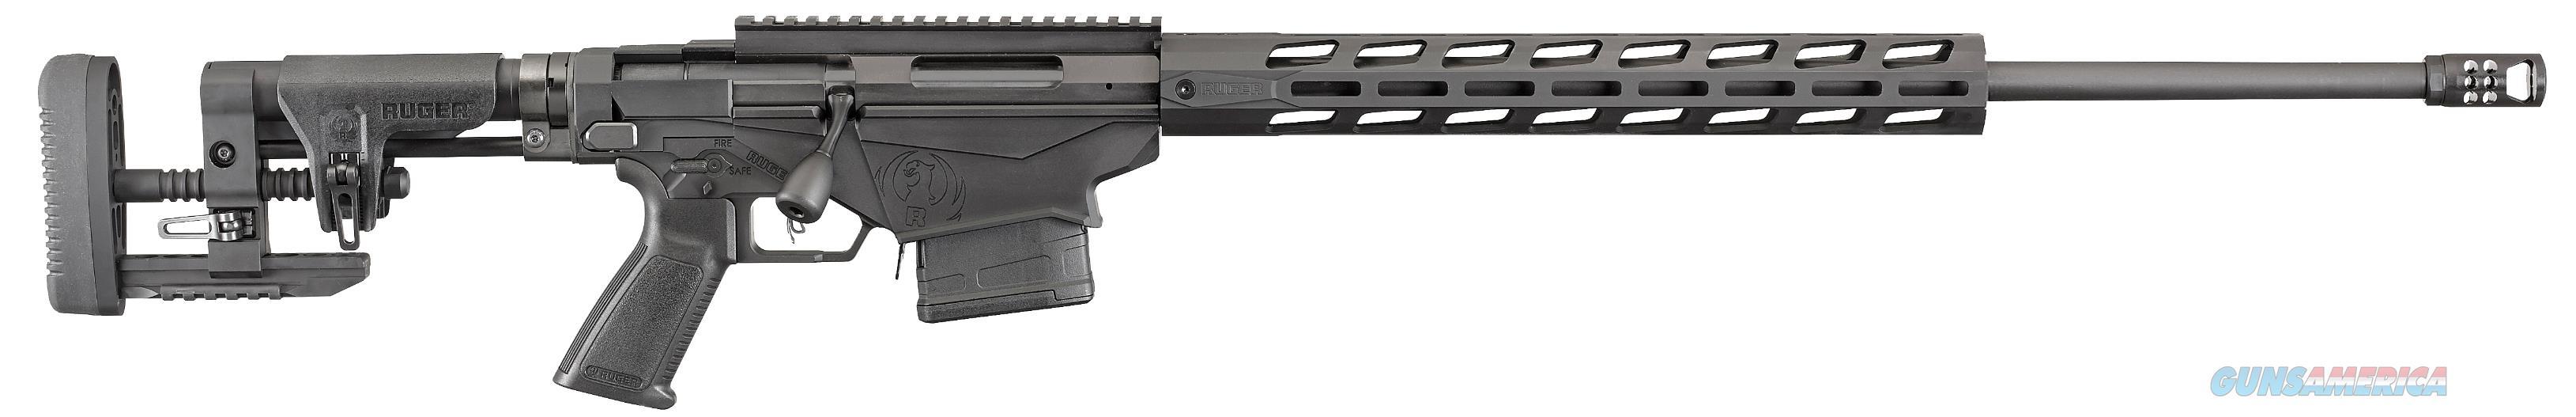 Ruger Precision, Rug 18028 Precision 308   15in Mlok Hndgrd 20  10r  Guns > Pistols > 1911 Pistol Copies (non-Colt)